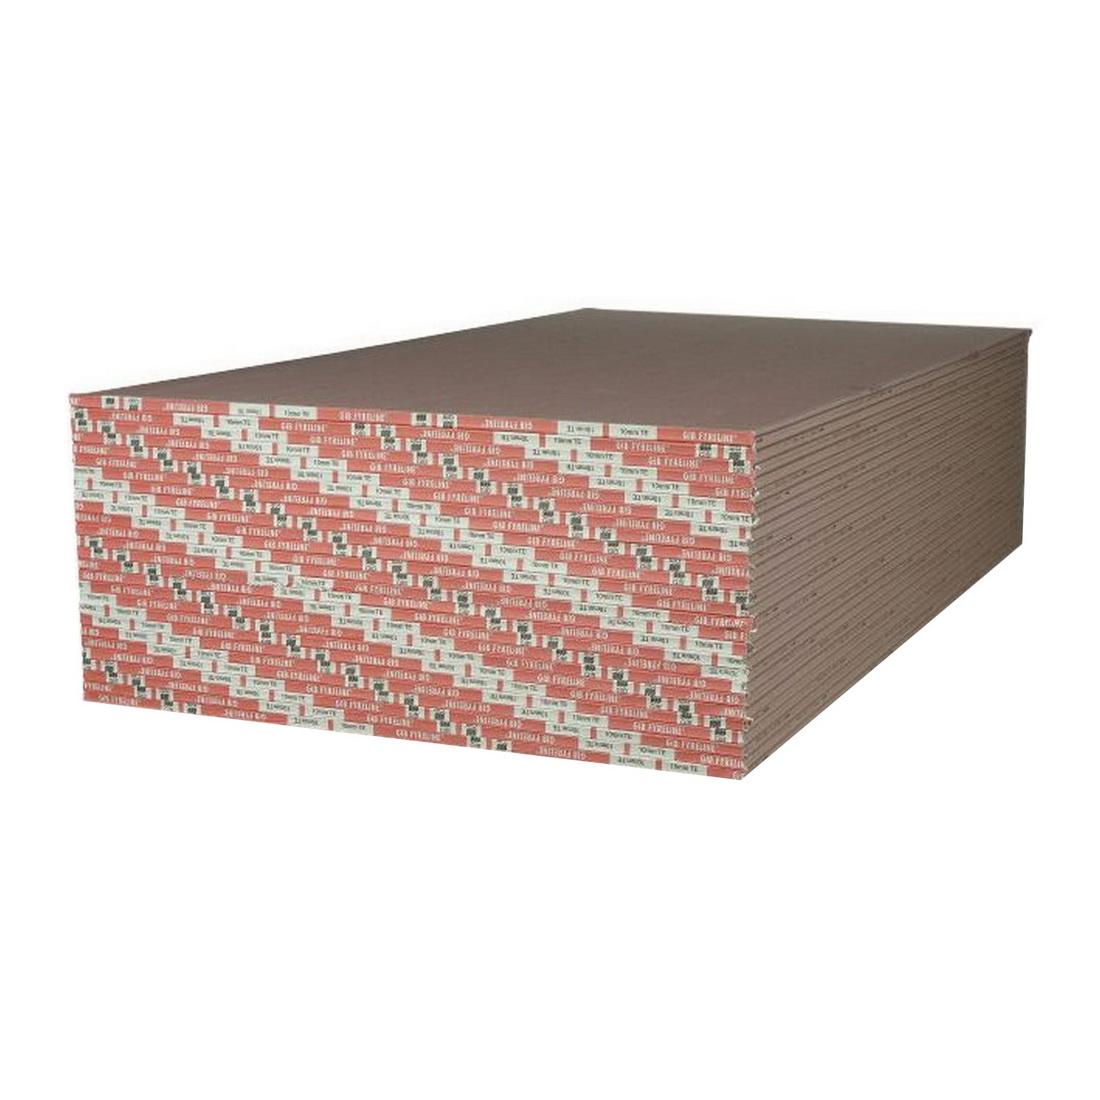 Fyreline Plasterboard 3600 x 1200 x 13mm 11685